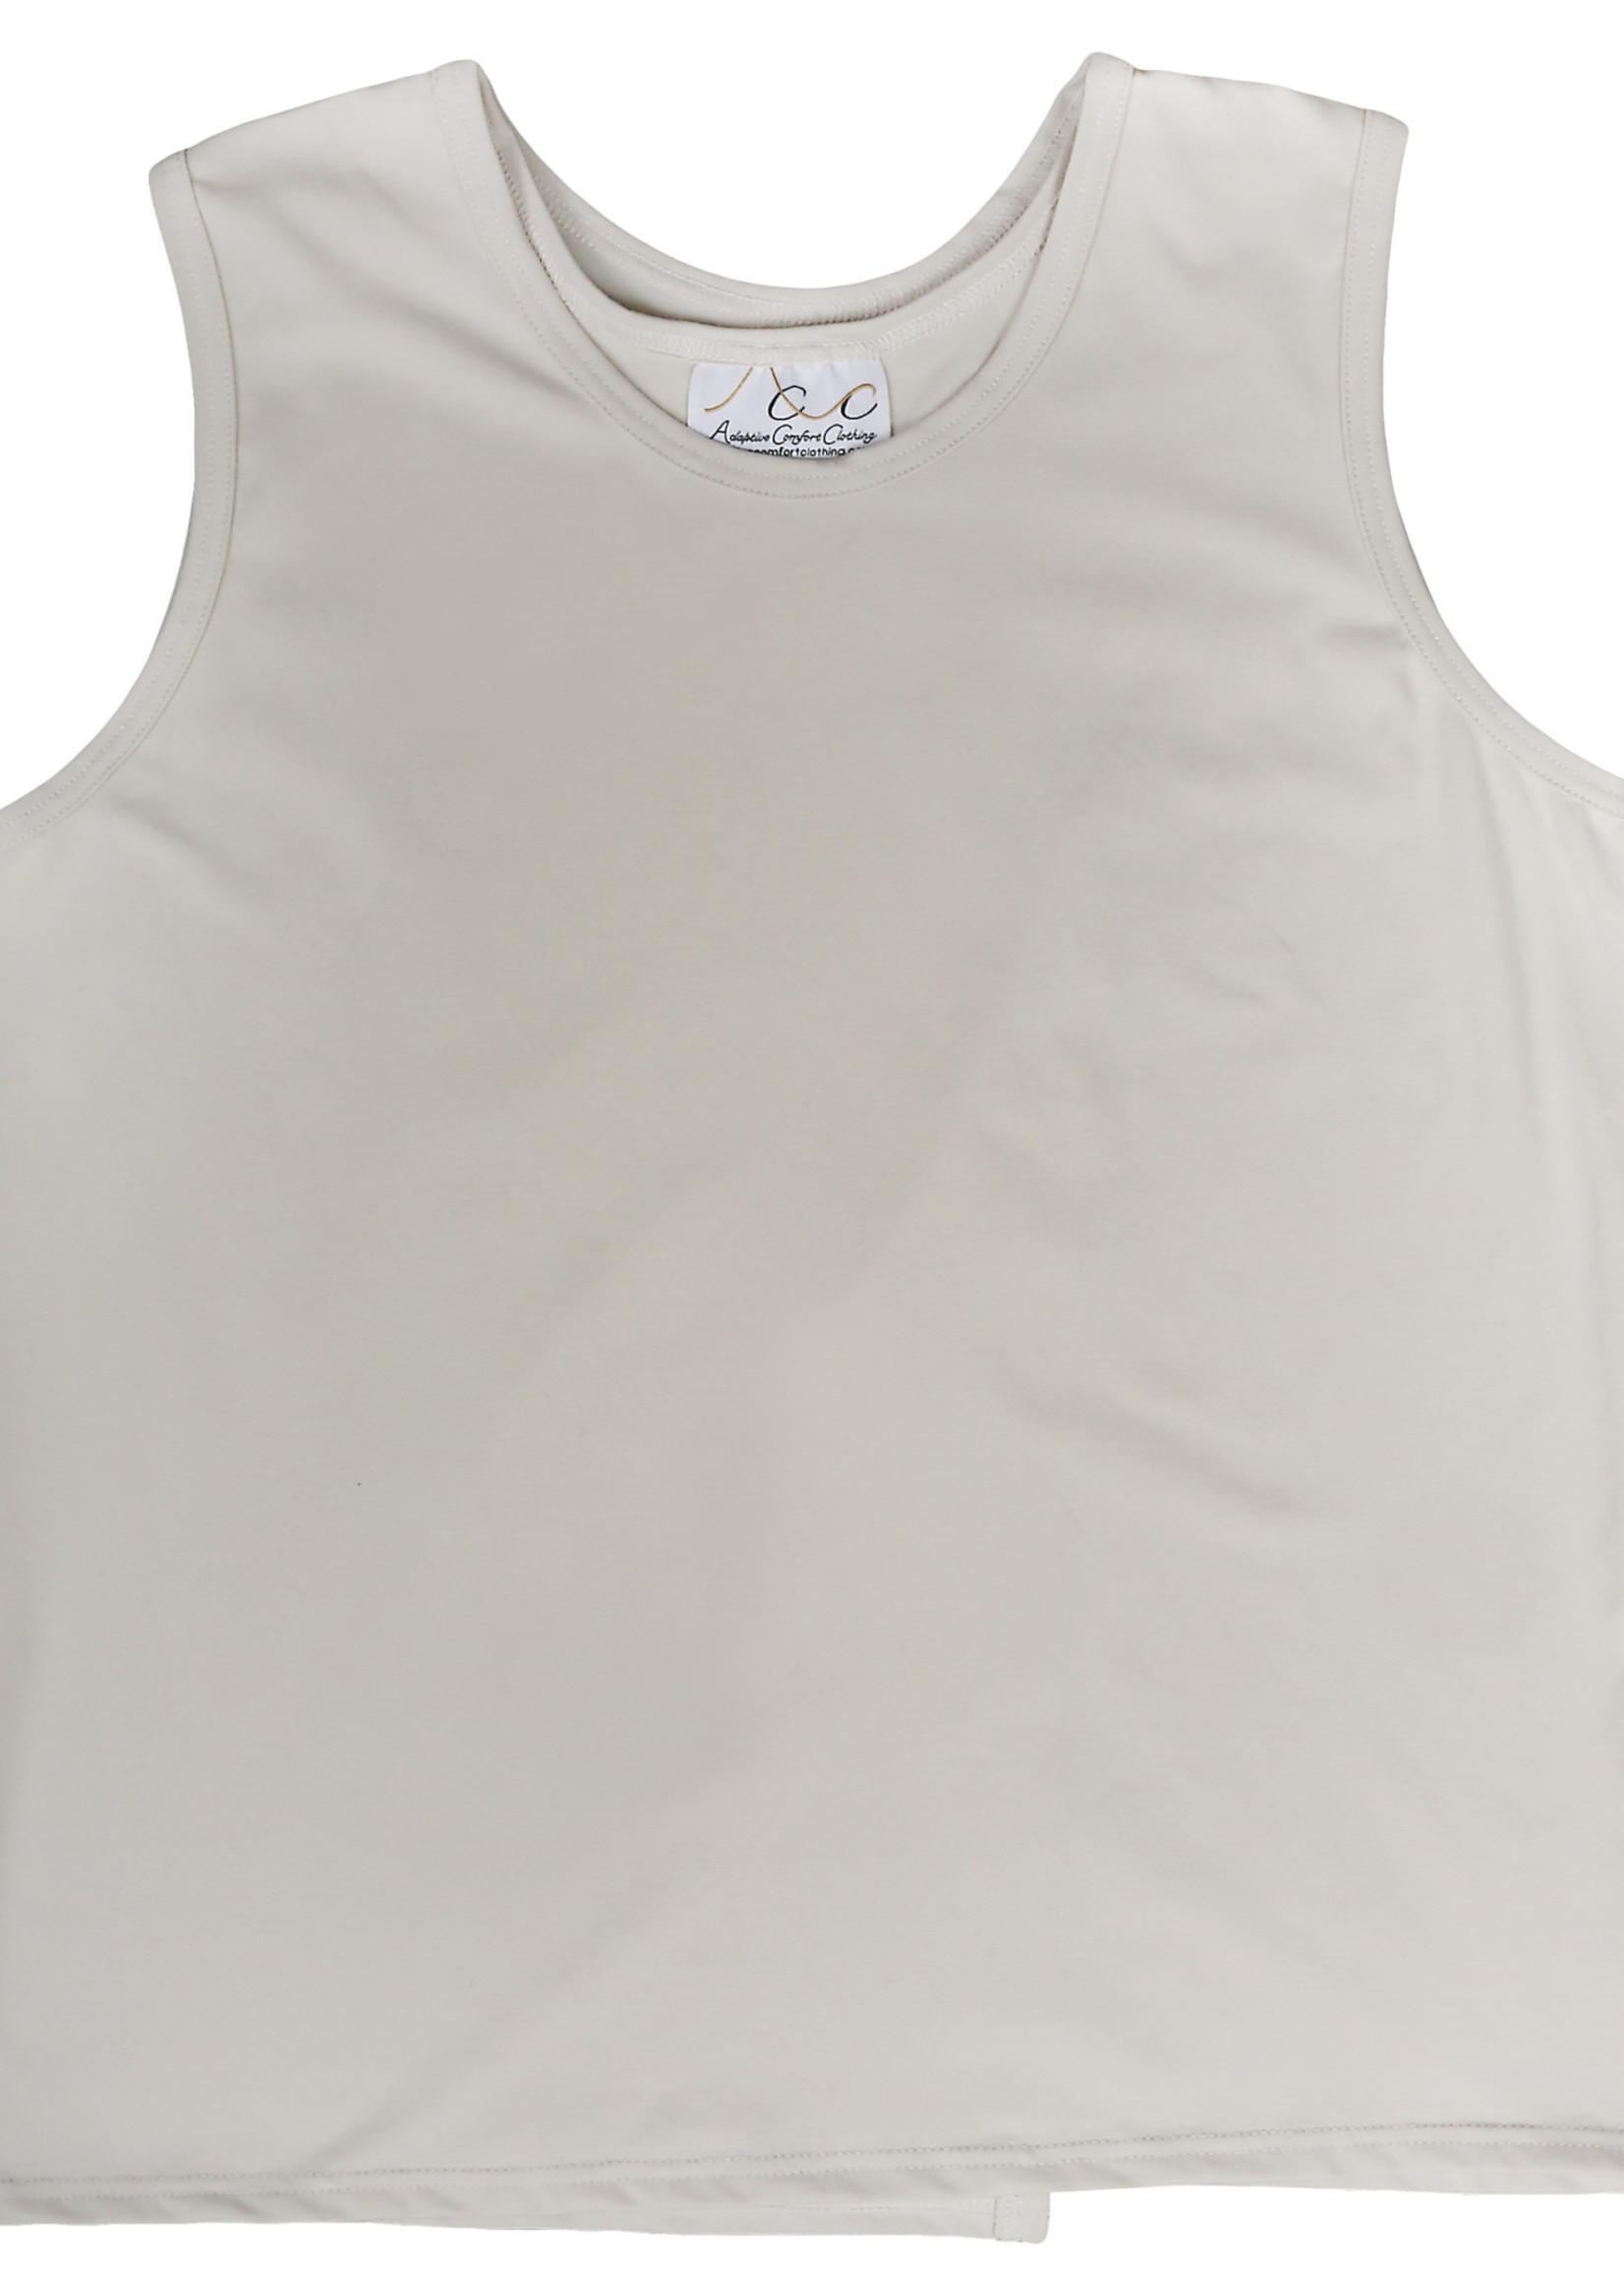 ACC Cotton Adaptive Undershirt